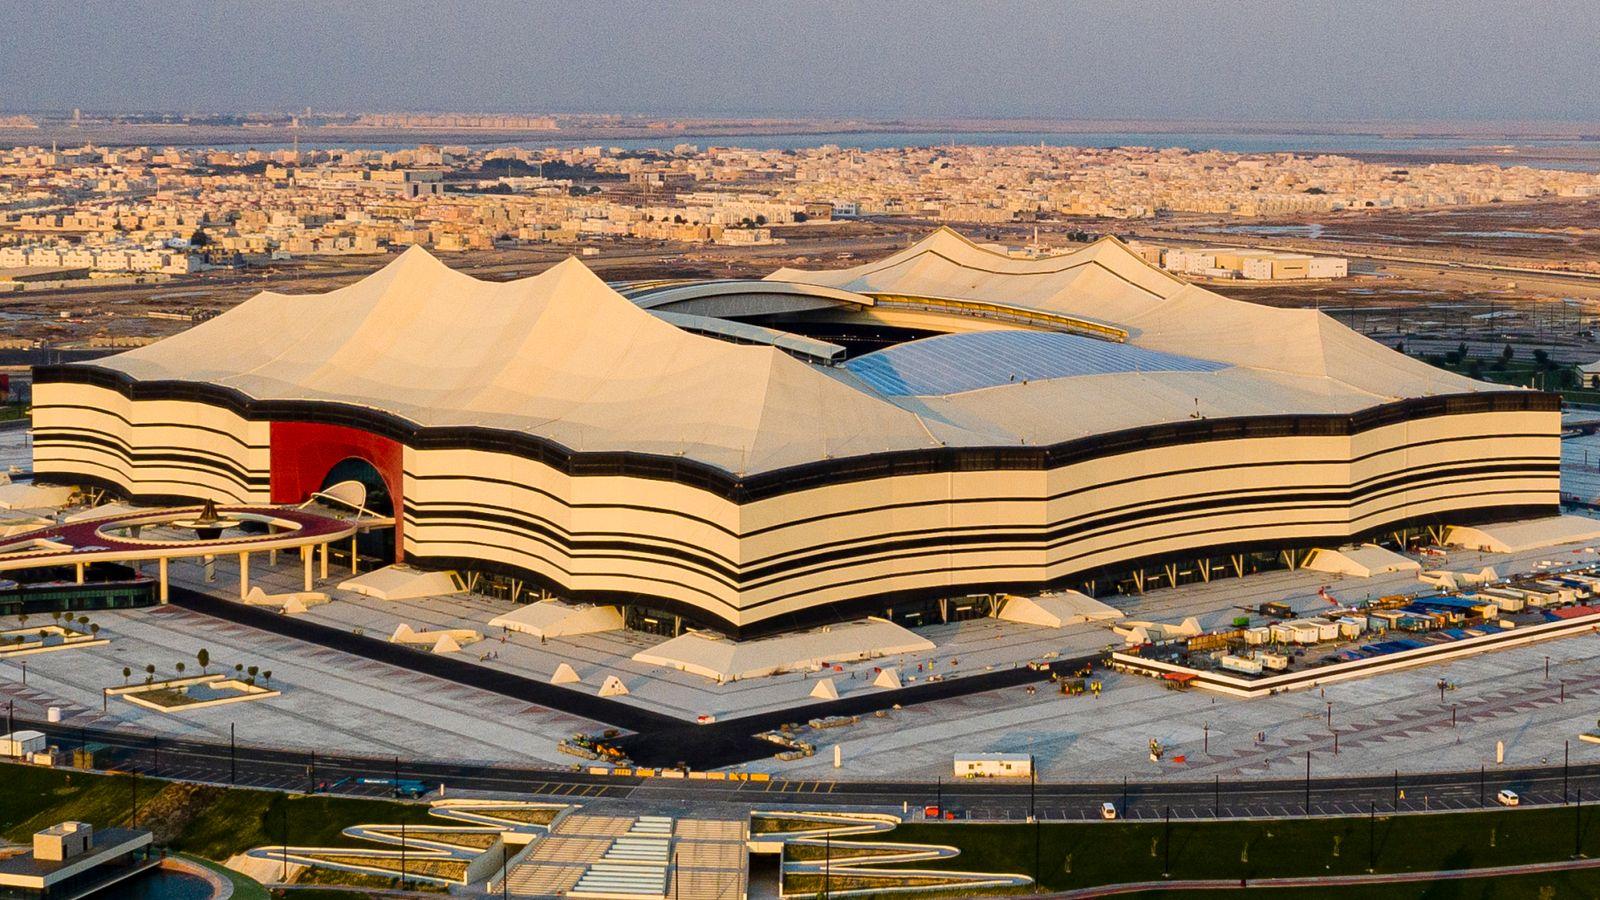 Qatar 2022 World Cup: Gianni Infantino impressed by progress of  preparations | Football News | Sky Sports